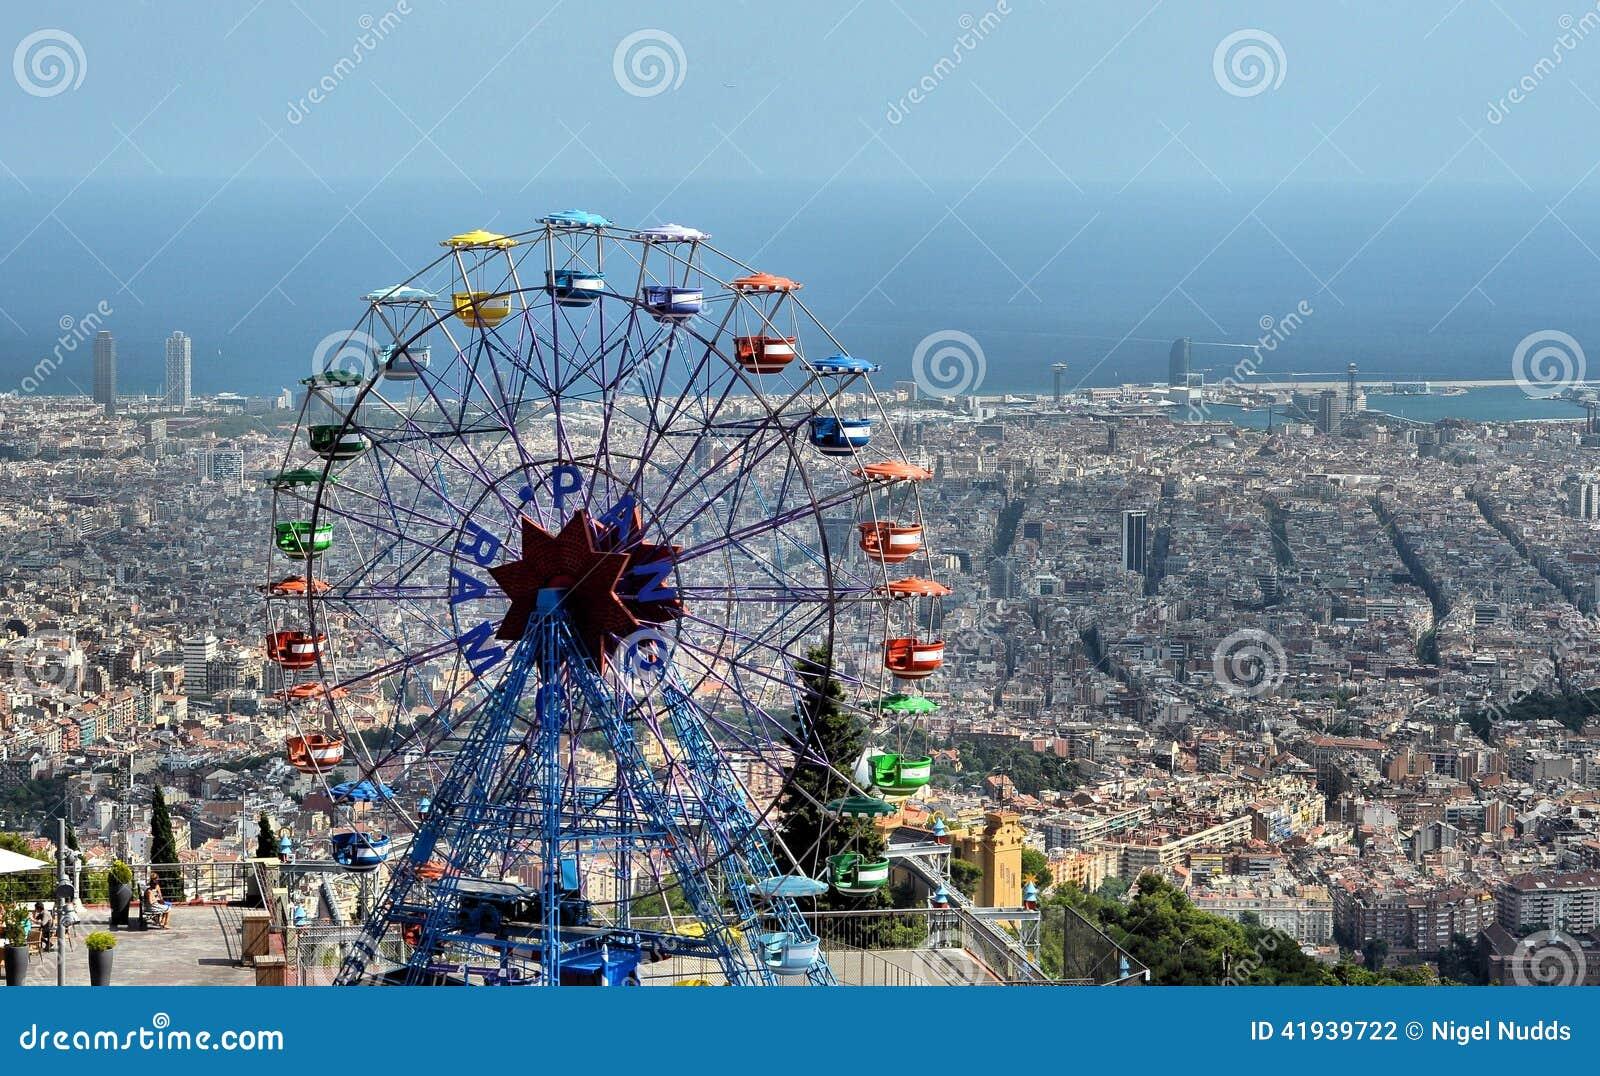 Tibidabo Amusement Park - Barcelona, Spain